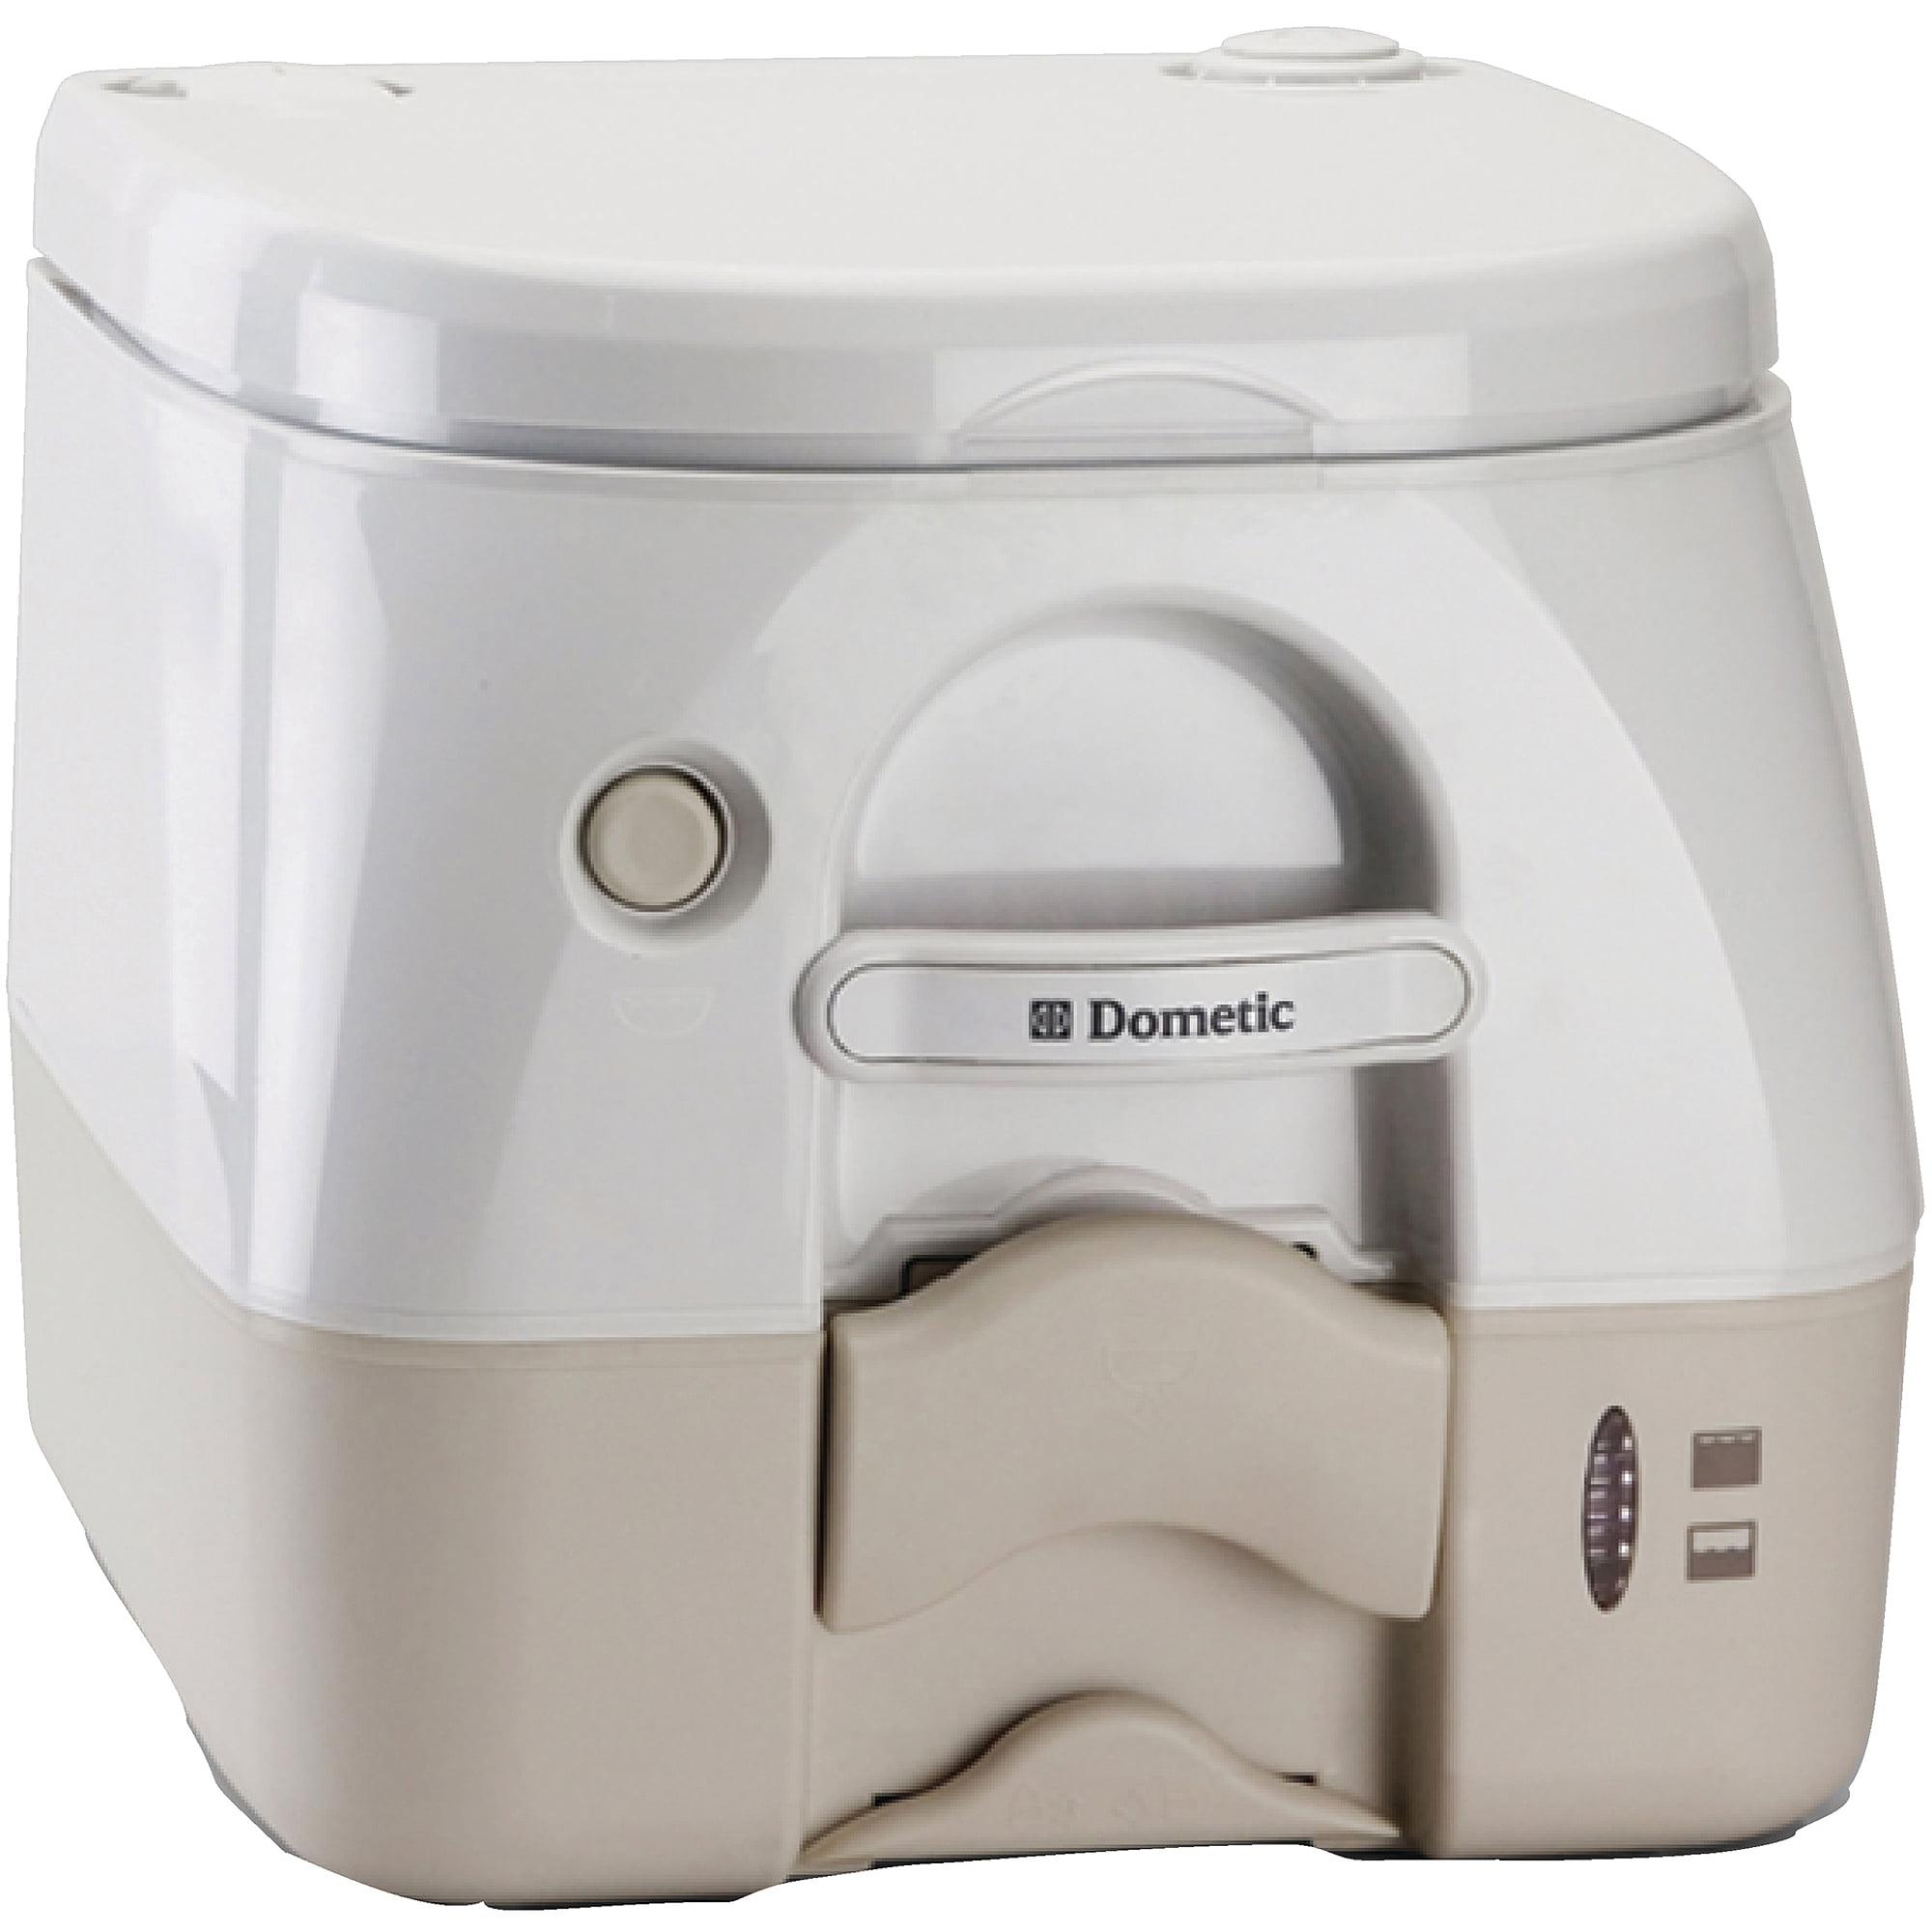 SeaLand 2.5 Gallon Full Size SaniPottie 974MSD Portable Toilet with Push Button Flush, Tan